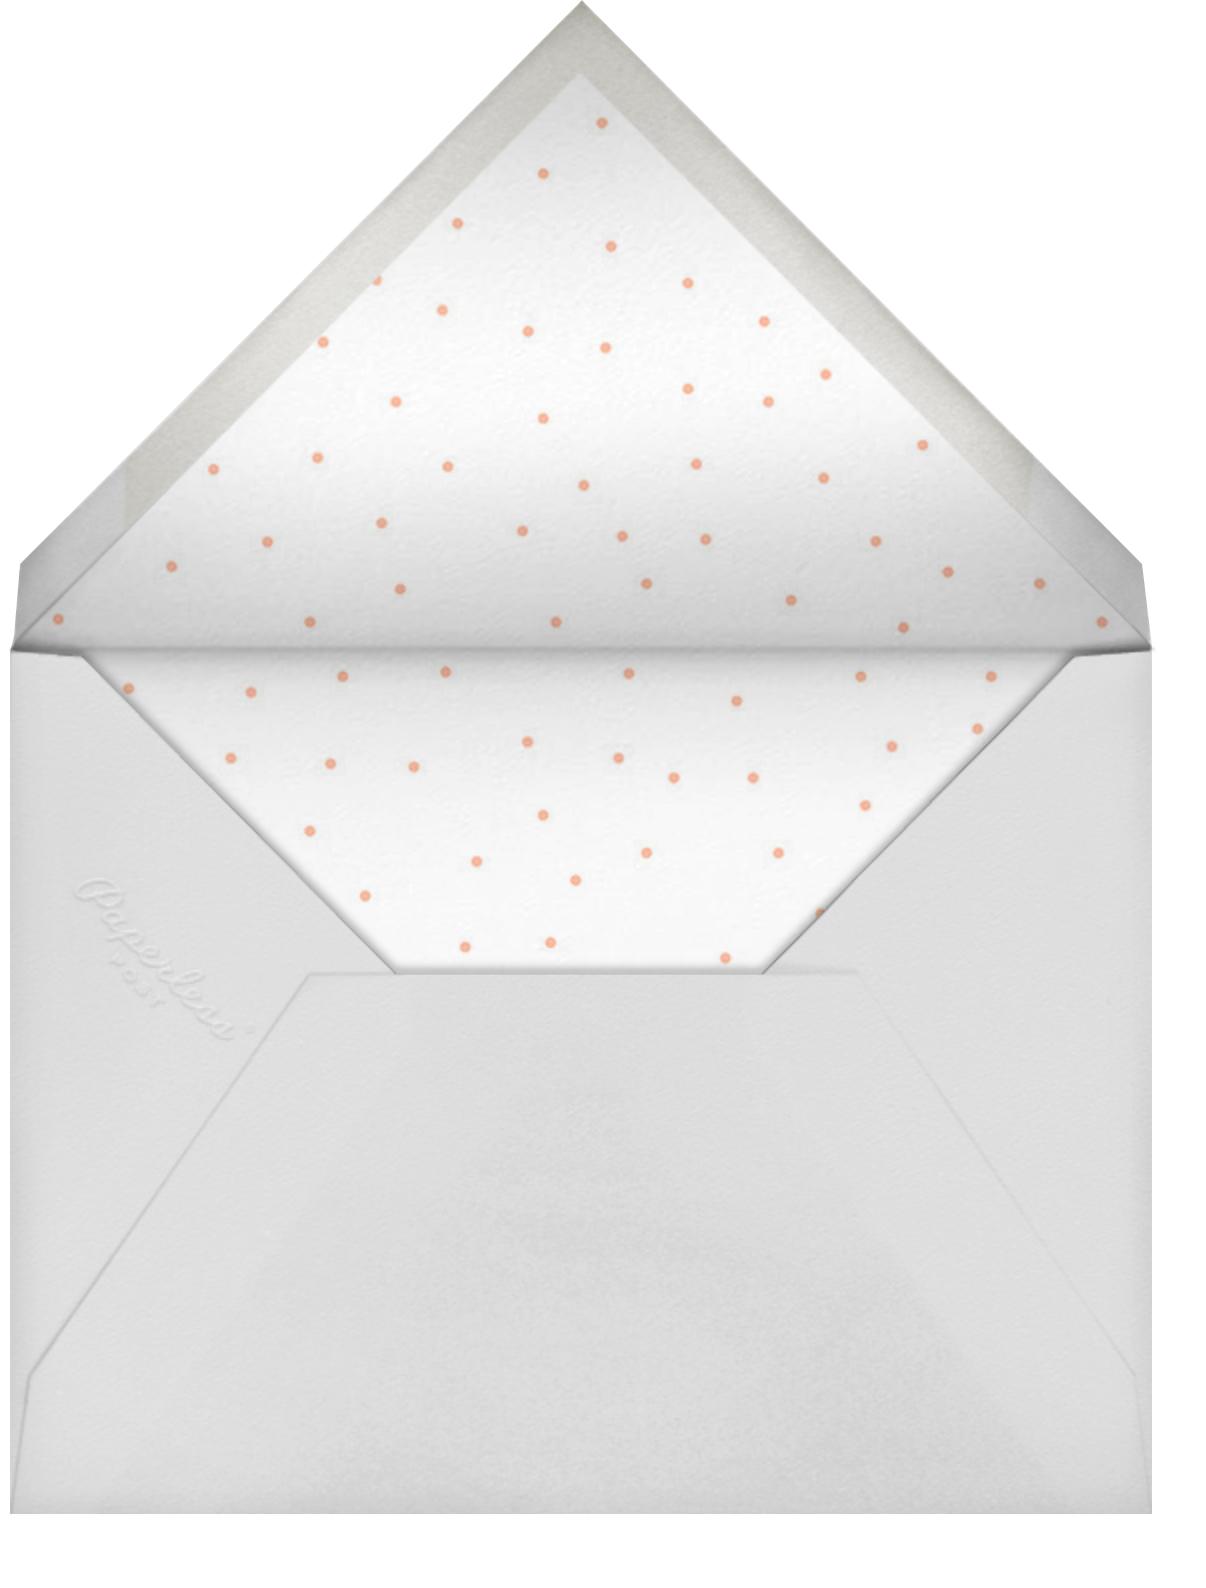 Watercolor Retirement - Maquillage - Paper Source - Envelope